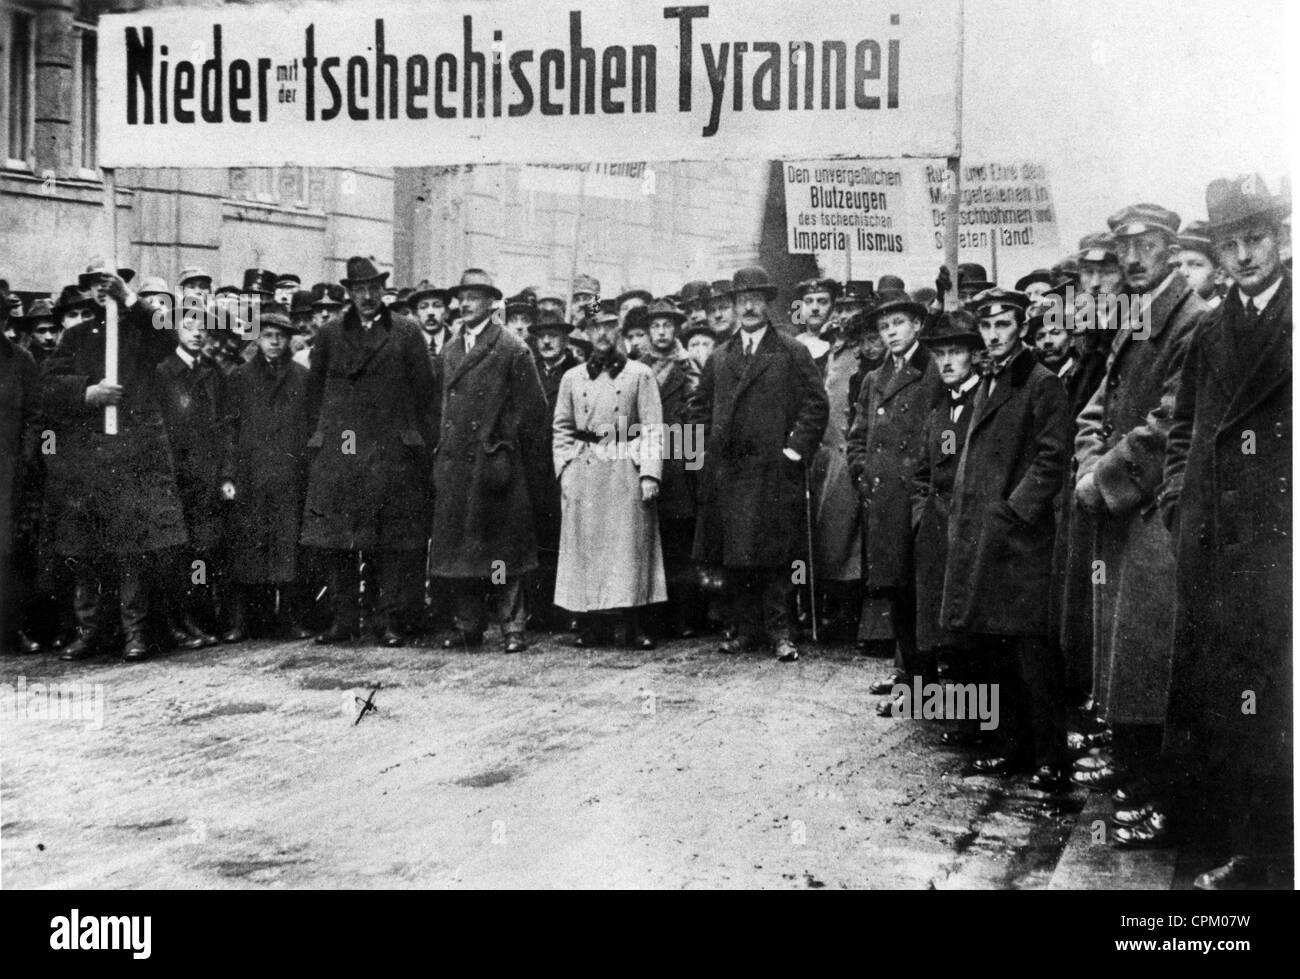 Anti-Czech demonstration in Vienna, 1919 - Stock Image